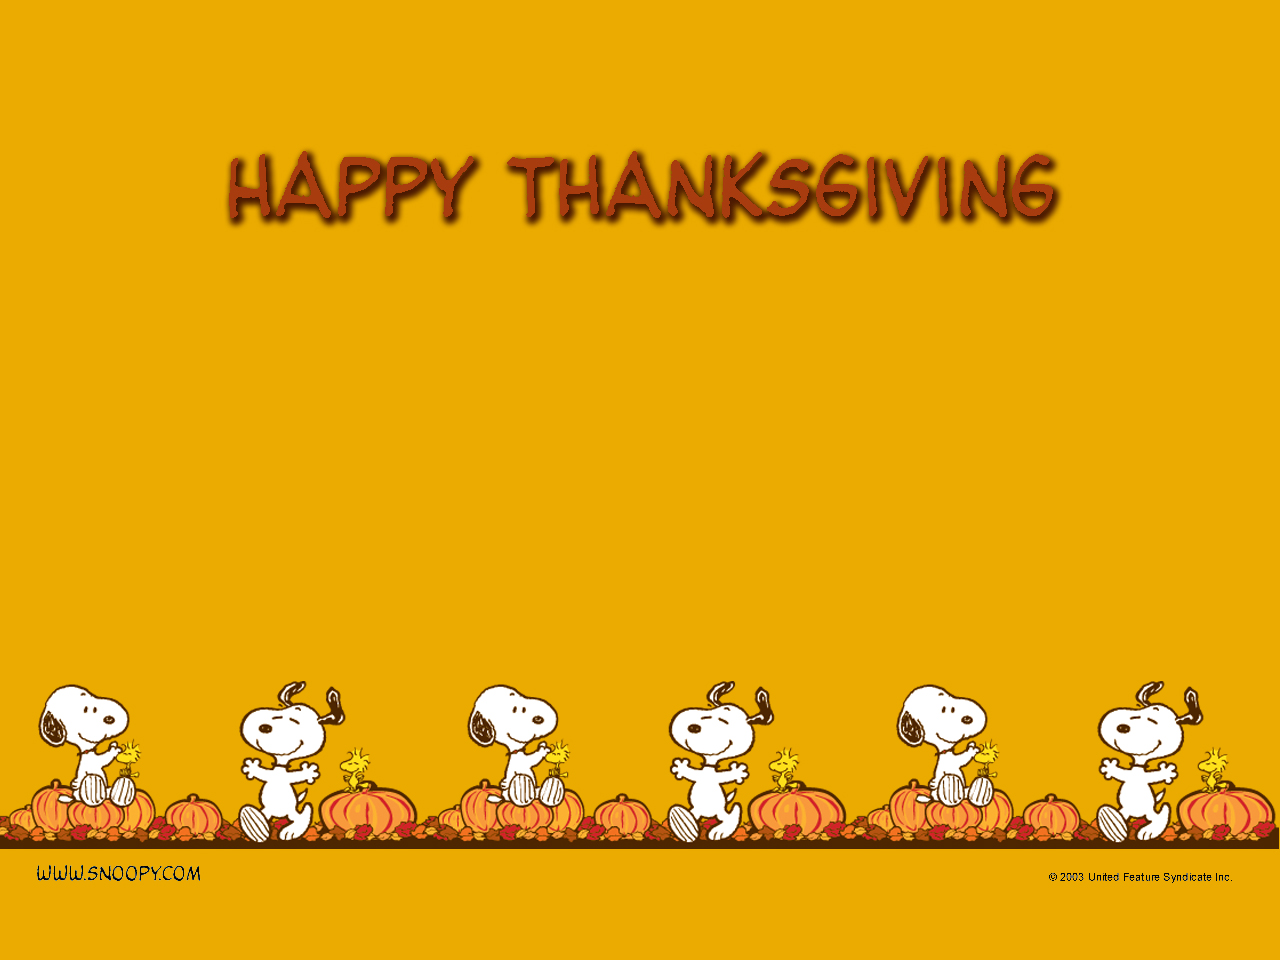 Thanksgiving Wallpapers 25 Desktop Backgrounds 1280x960